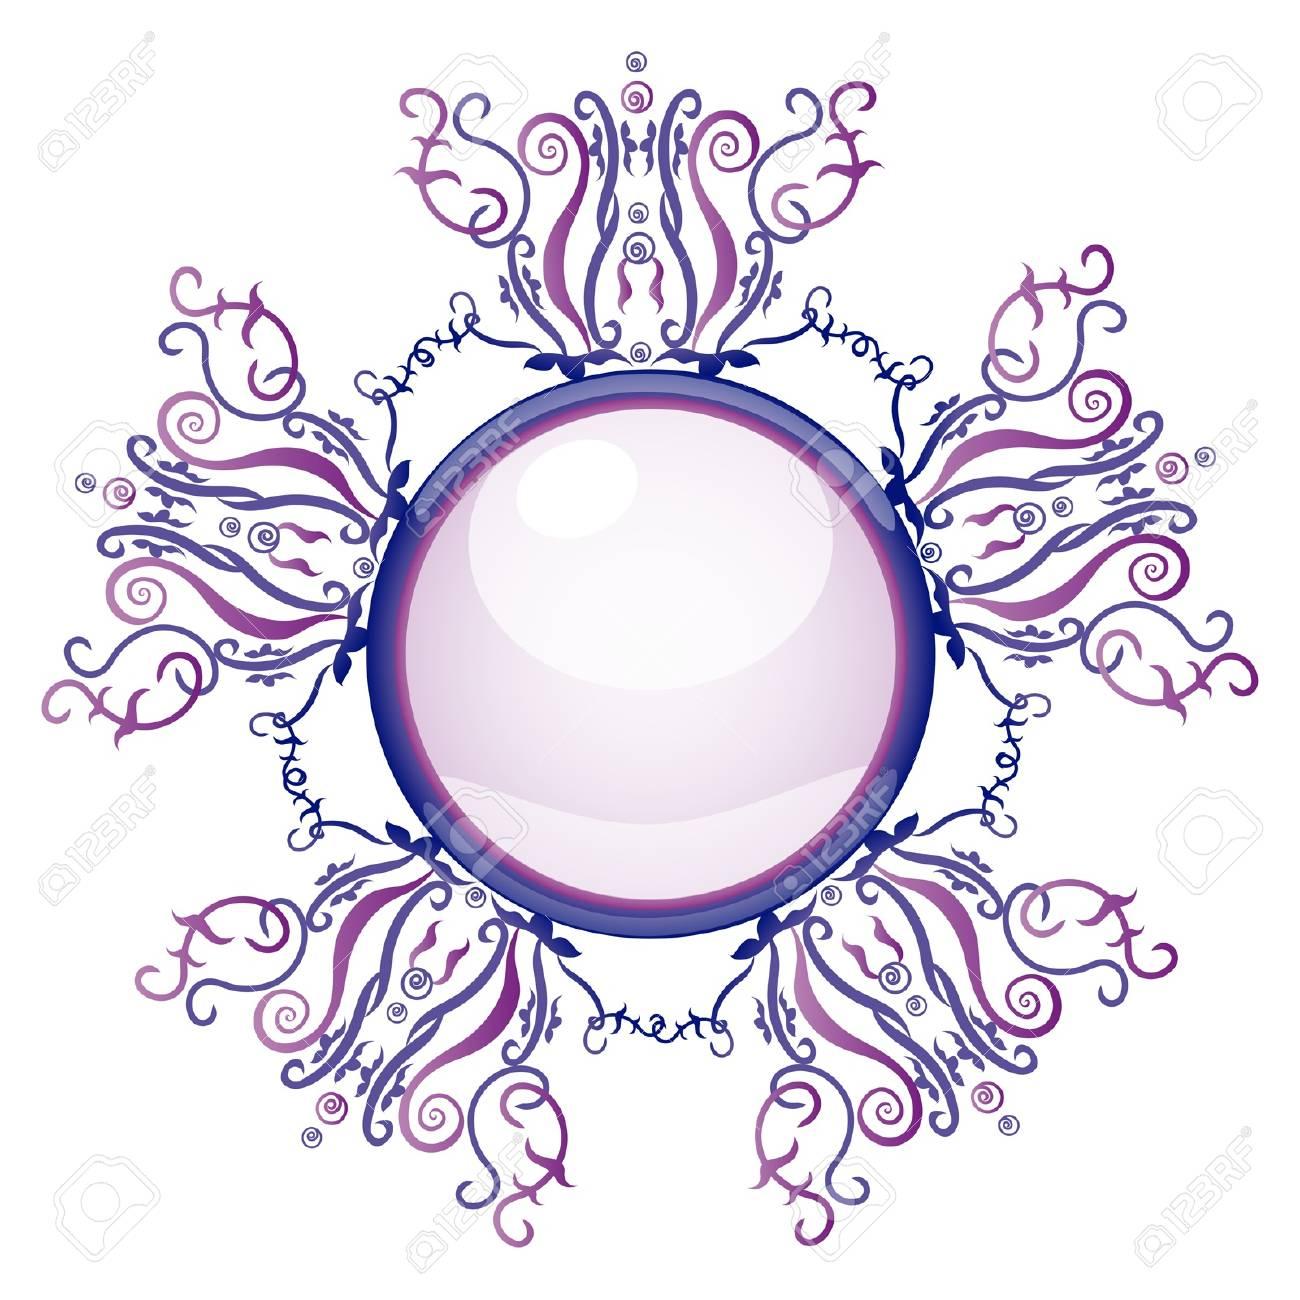 Violet and blue brooch. Illustration 10 version Stock Vector - 18183449